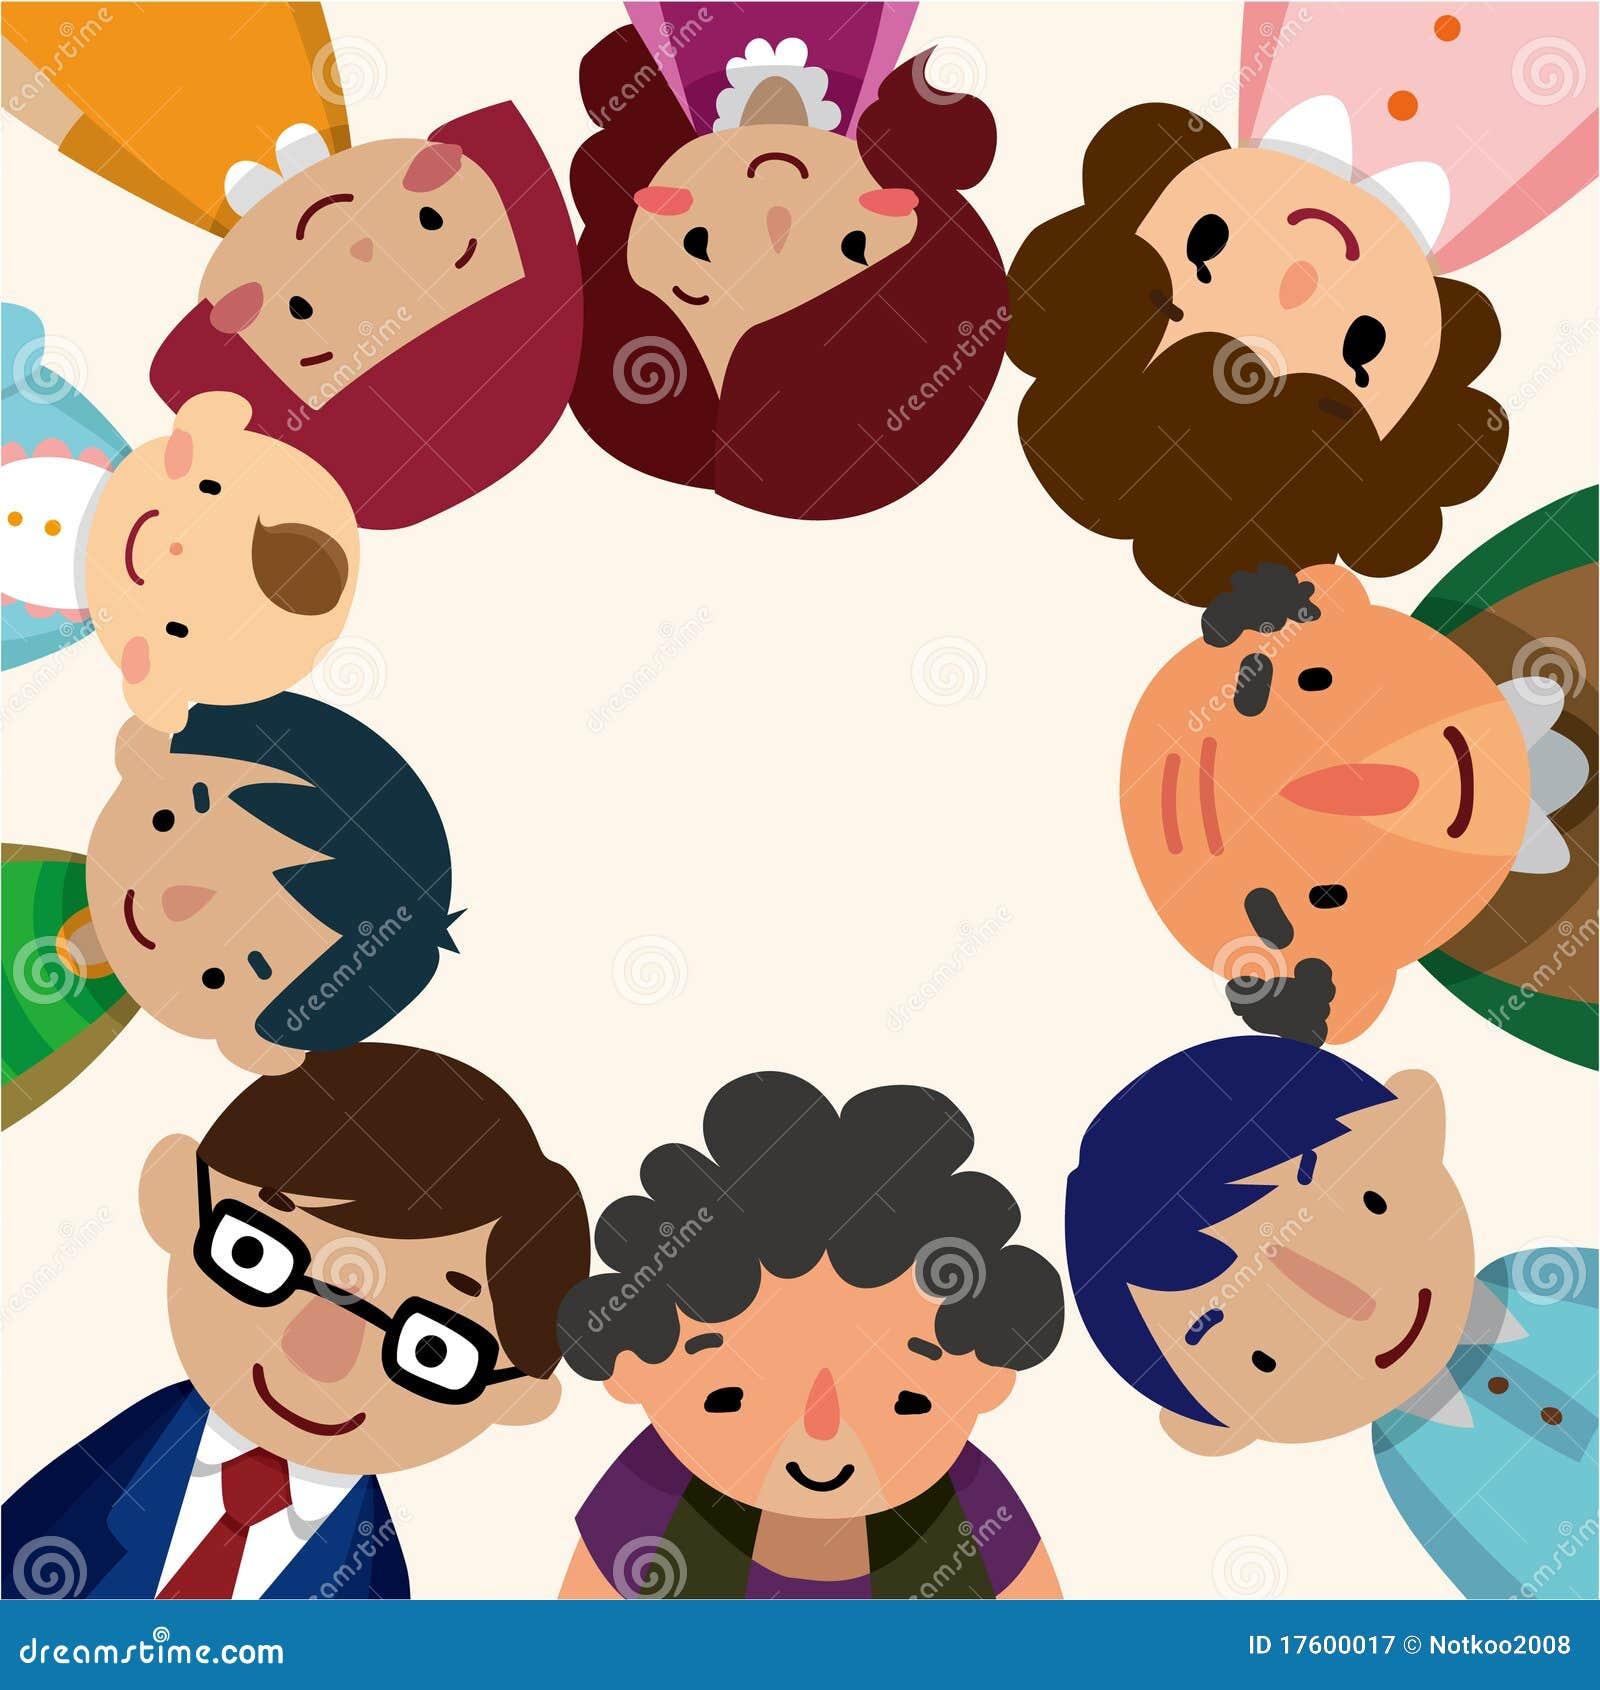 Home Design Decor App Cartoon Family Card Royalty Free Stock Photography Image